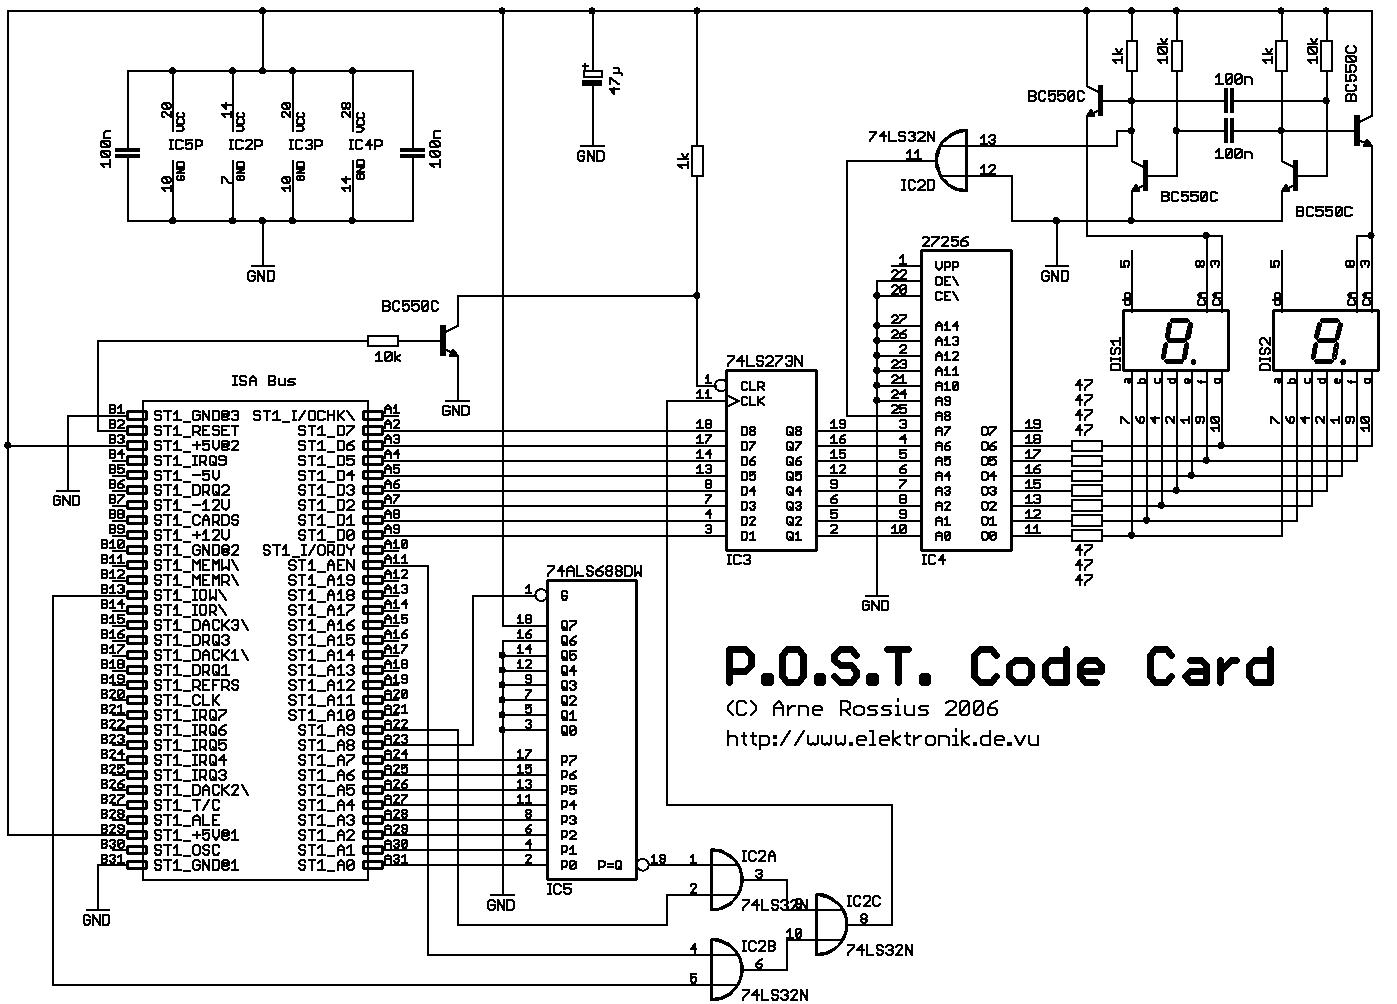 Elektronik.de.vu - ISA-Karte zur Anzeige des P.O.S.T.-Codes